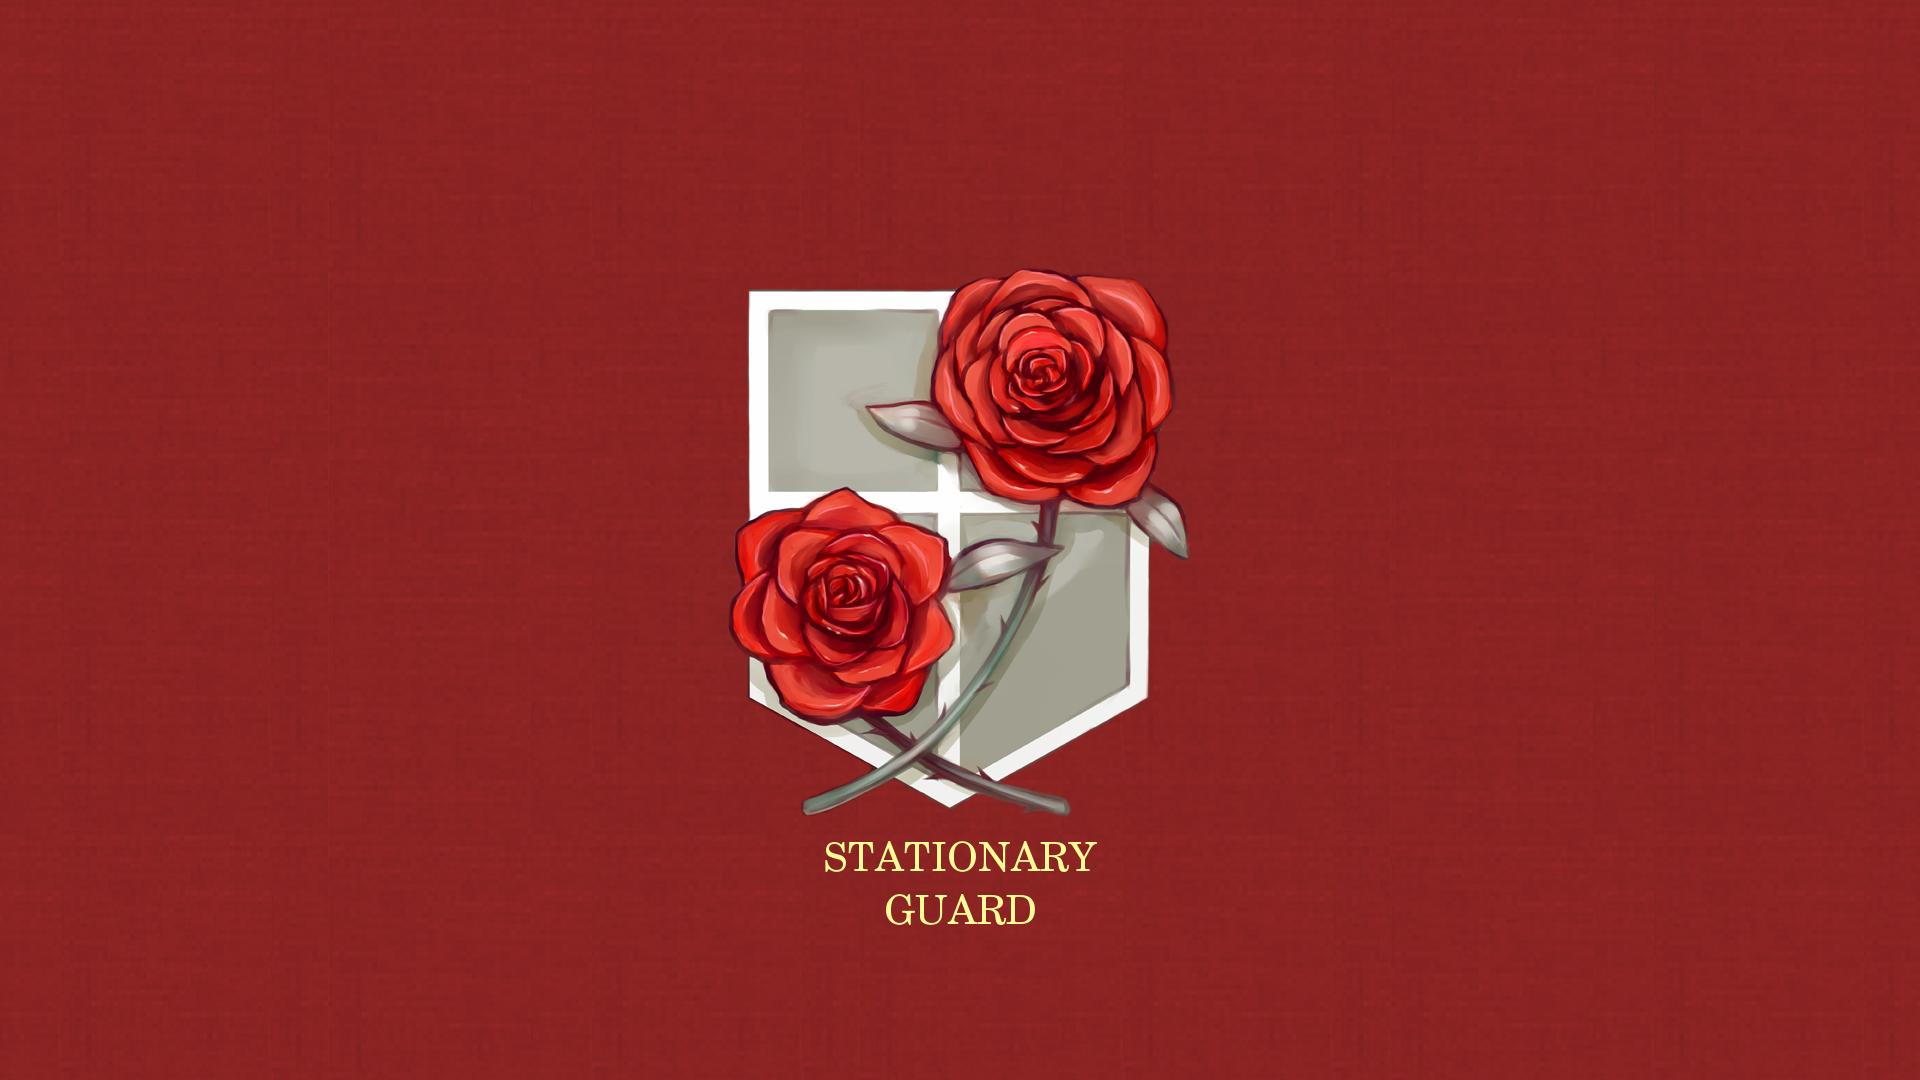 Attack On Titan Stationary Guard Wallpaper Redux By Imxset21 On Deviantart